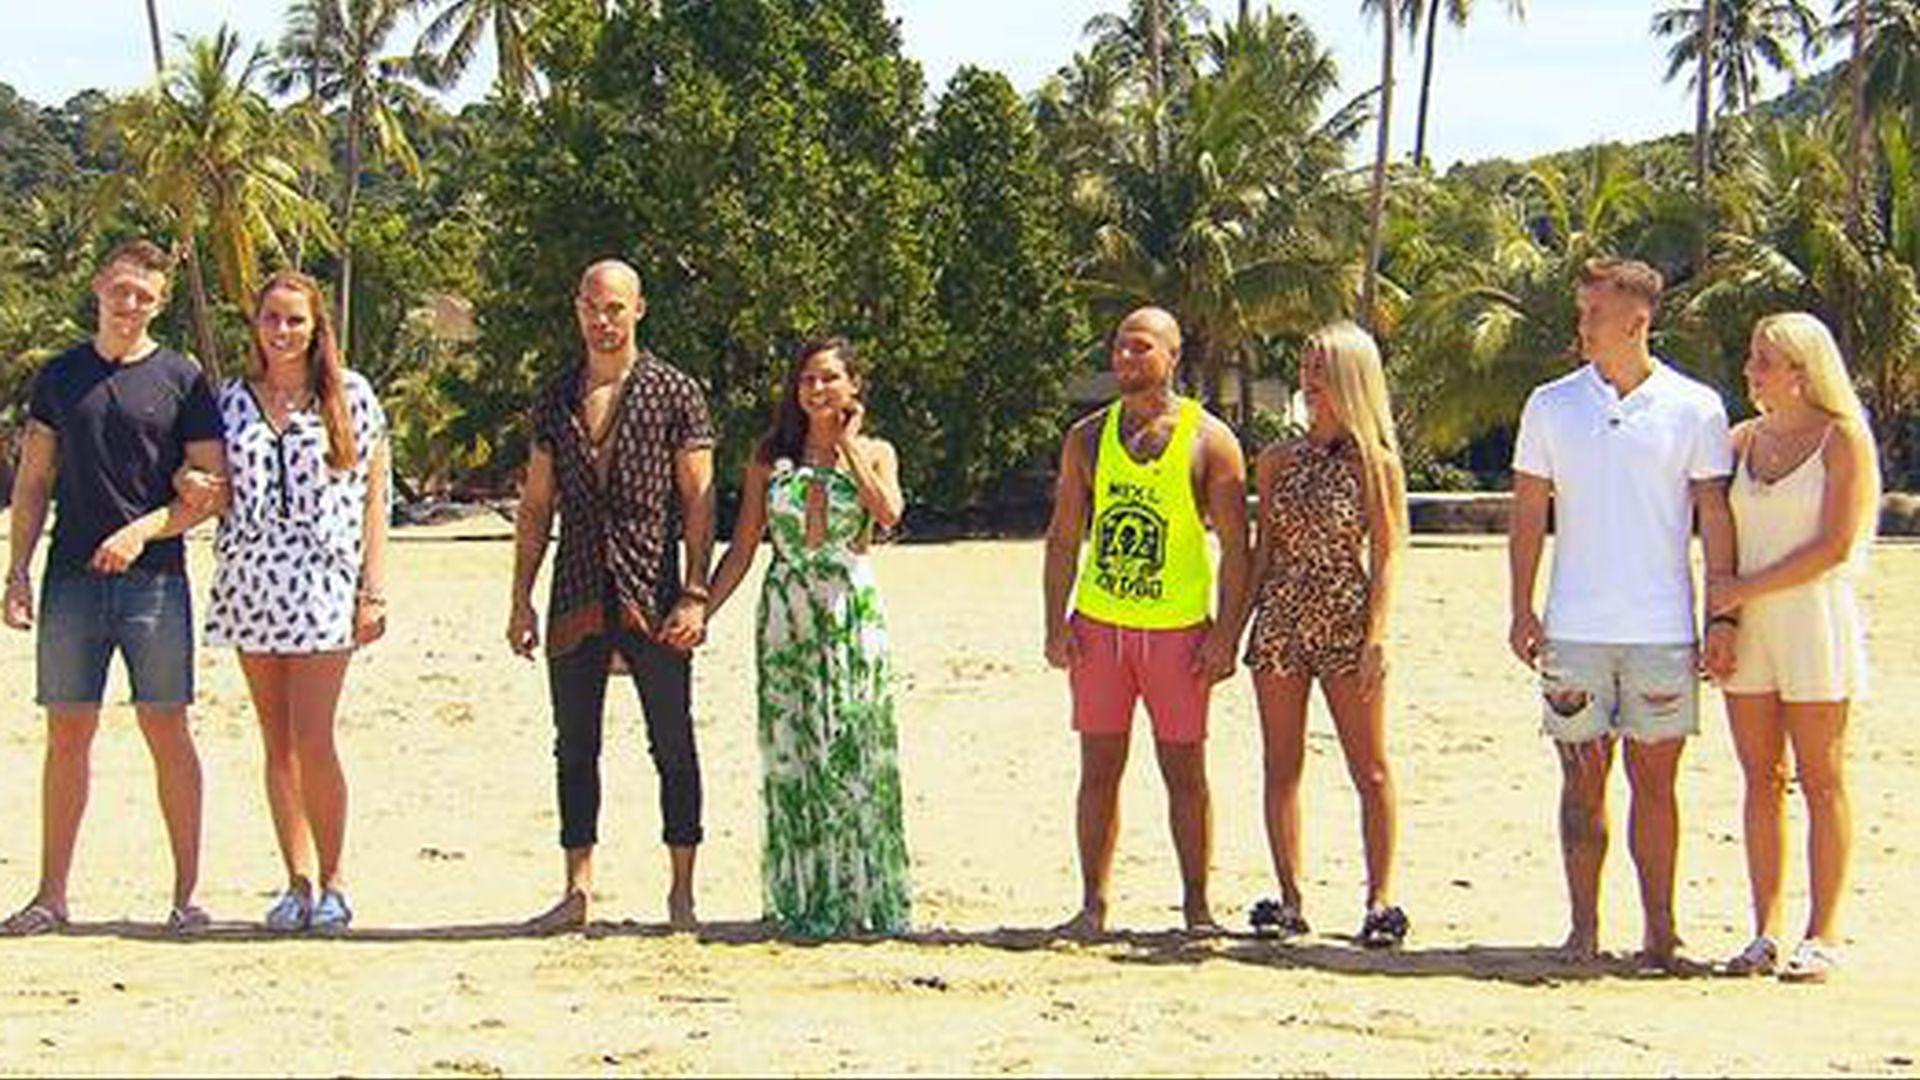 Island dating shows 2019 2019 usa